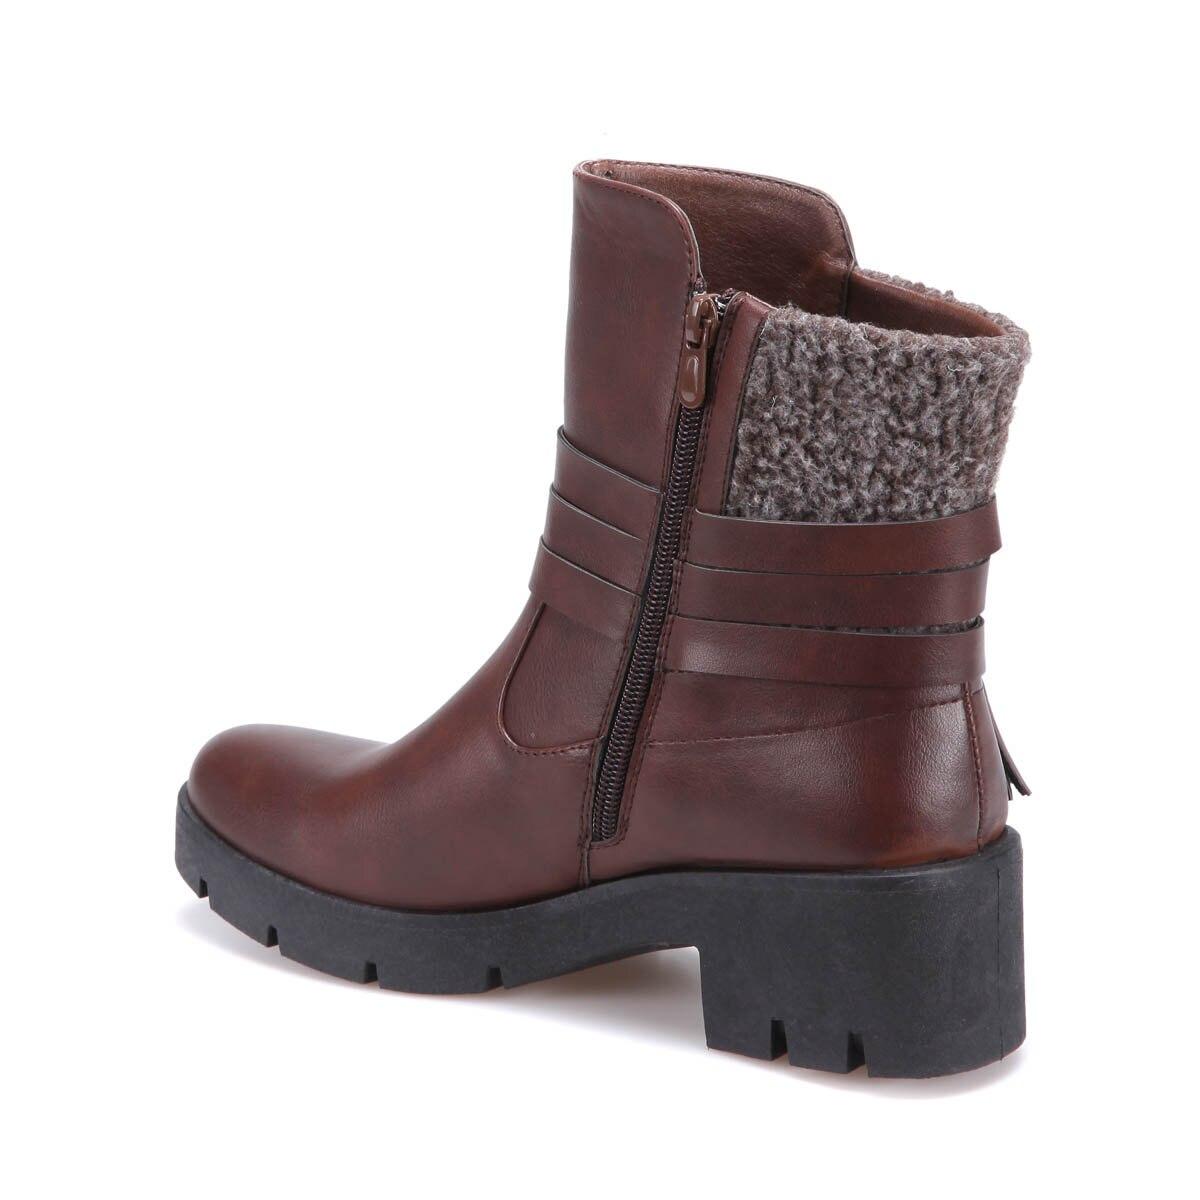 FLO CW17077 Brown Women 'S Boots Art Bella